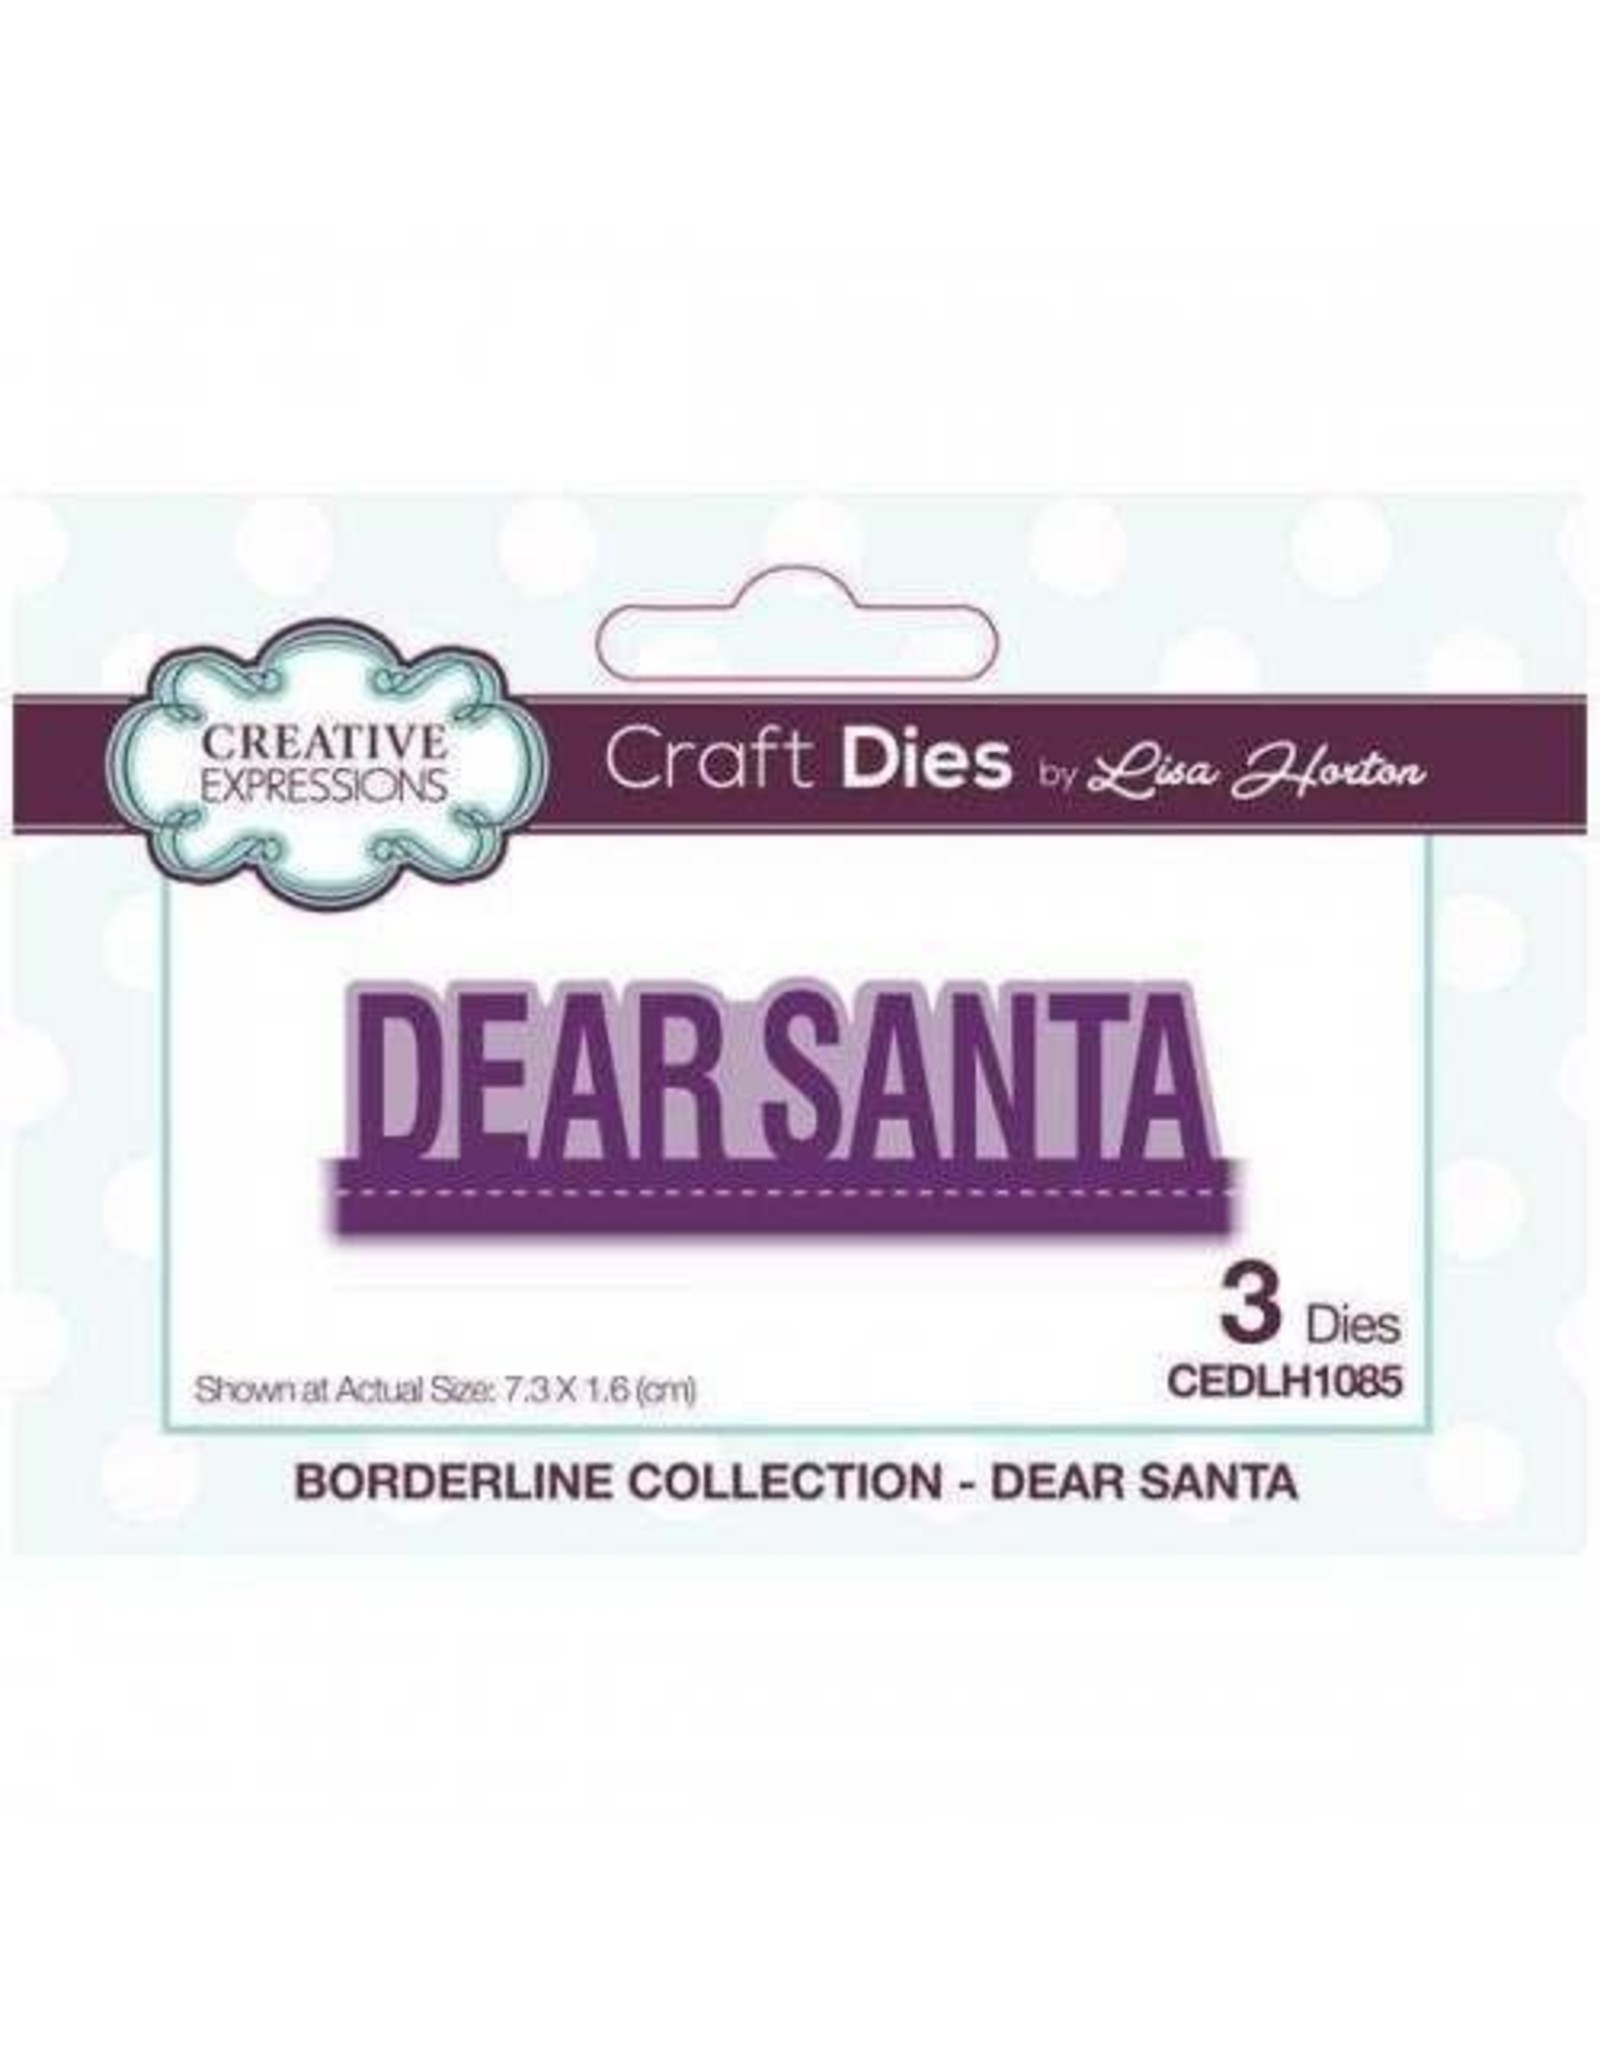 Creative Expressions Dear Santa - Borderline Collection Die